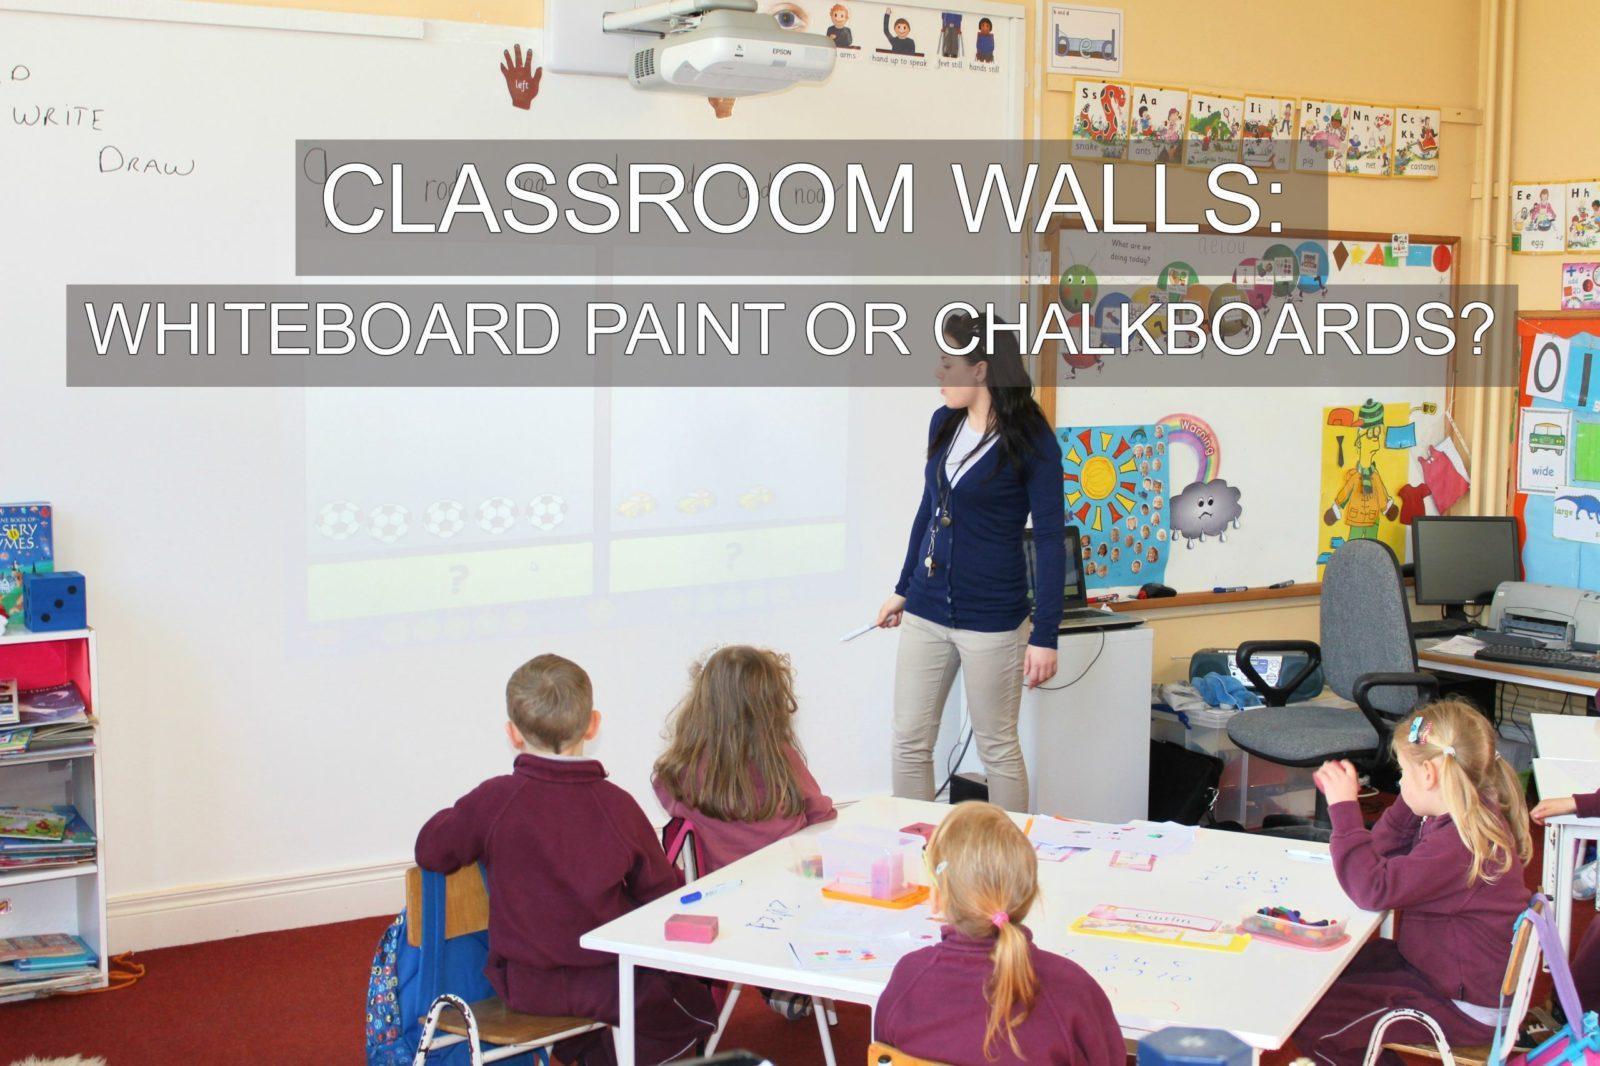 Whiteboardpainteducationrathoathjuniorschoolwhite-classroom.jpg